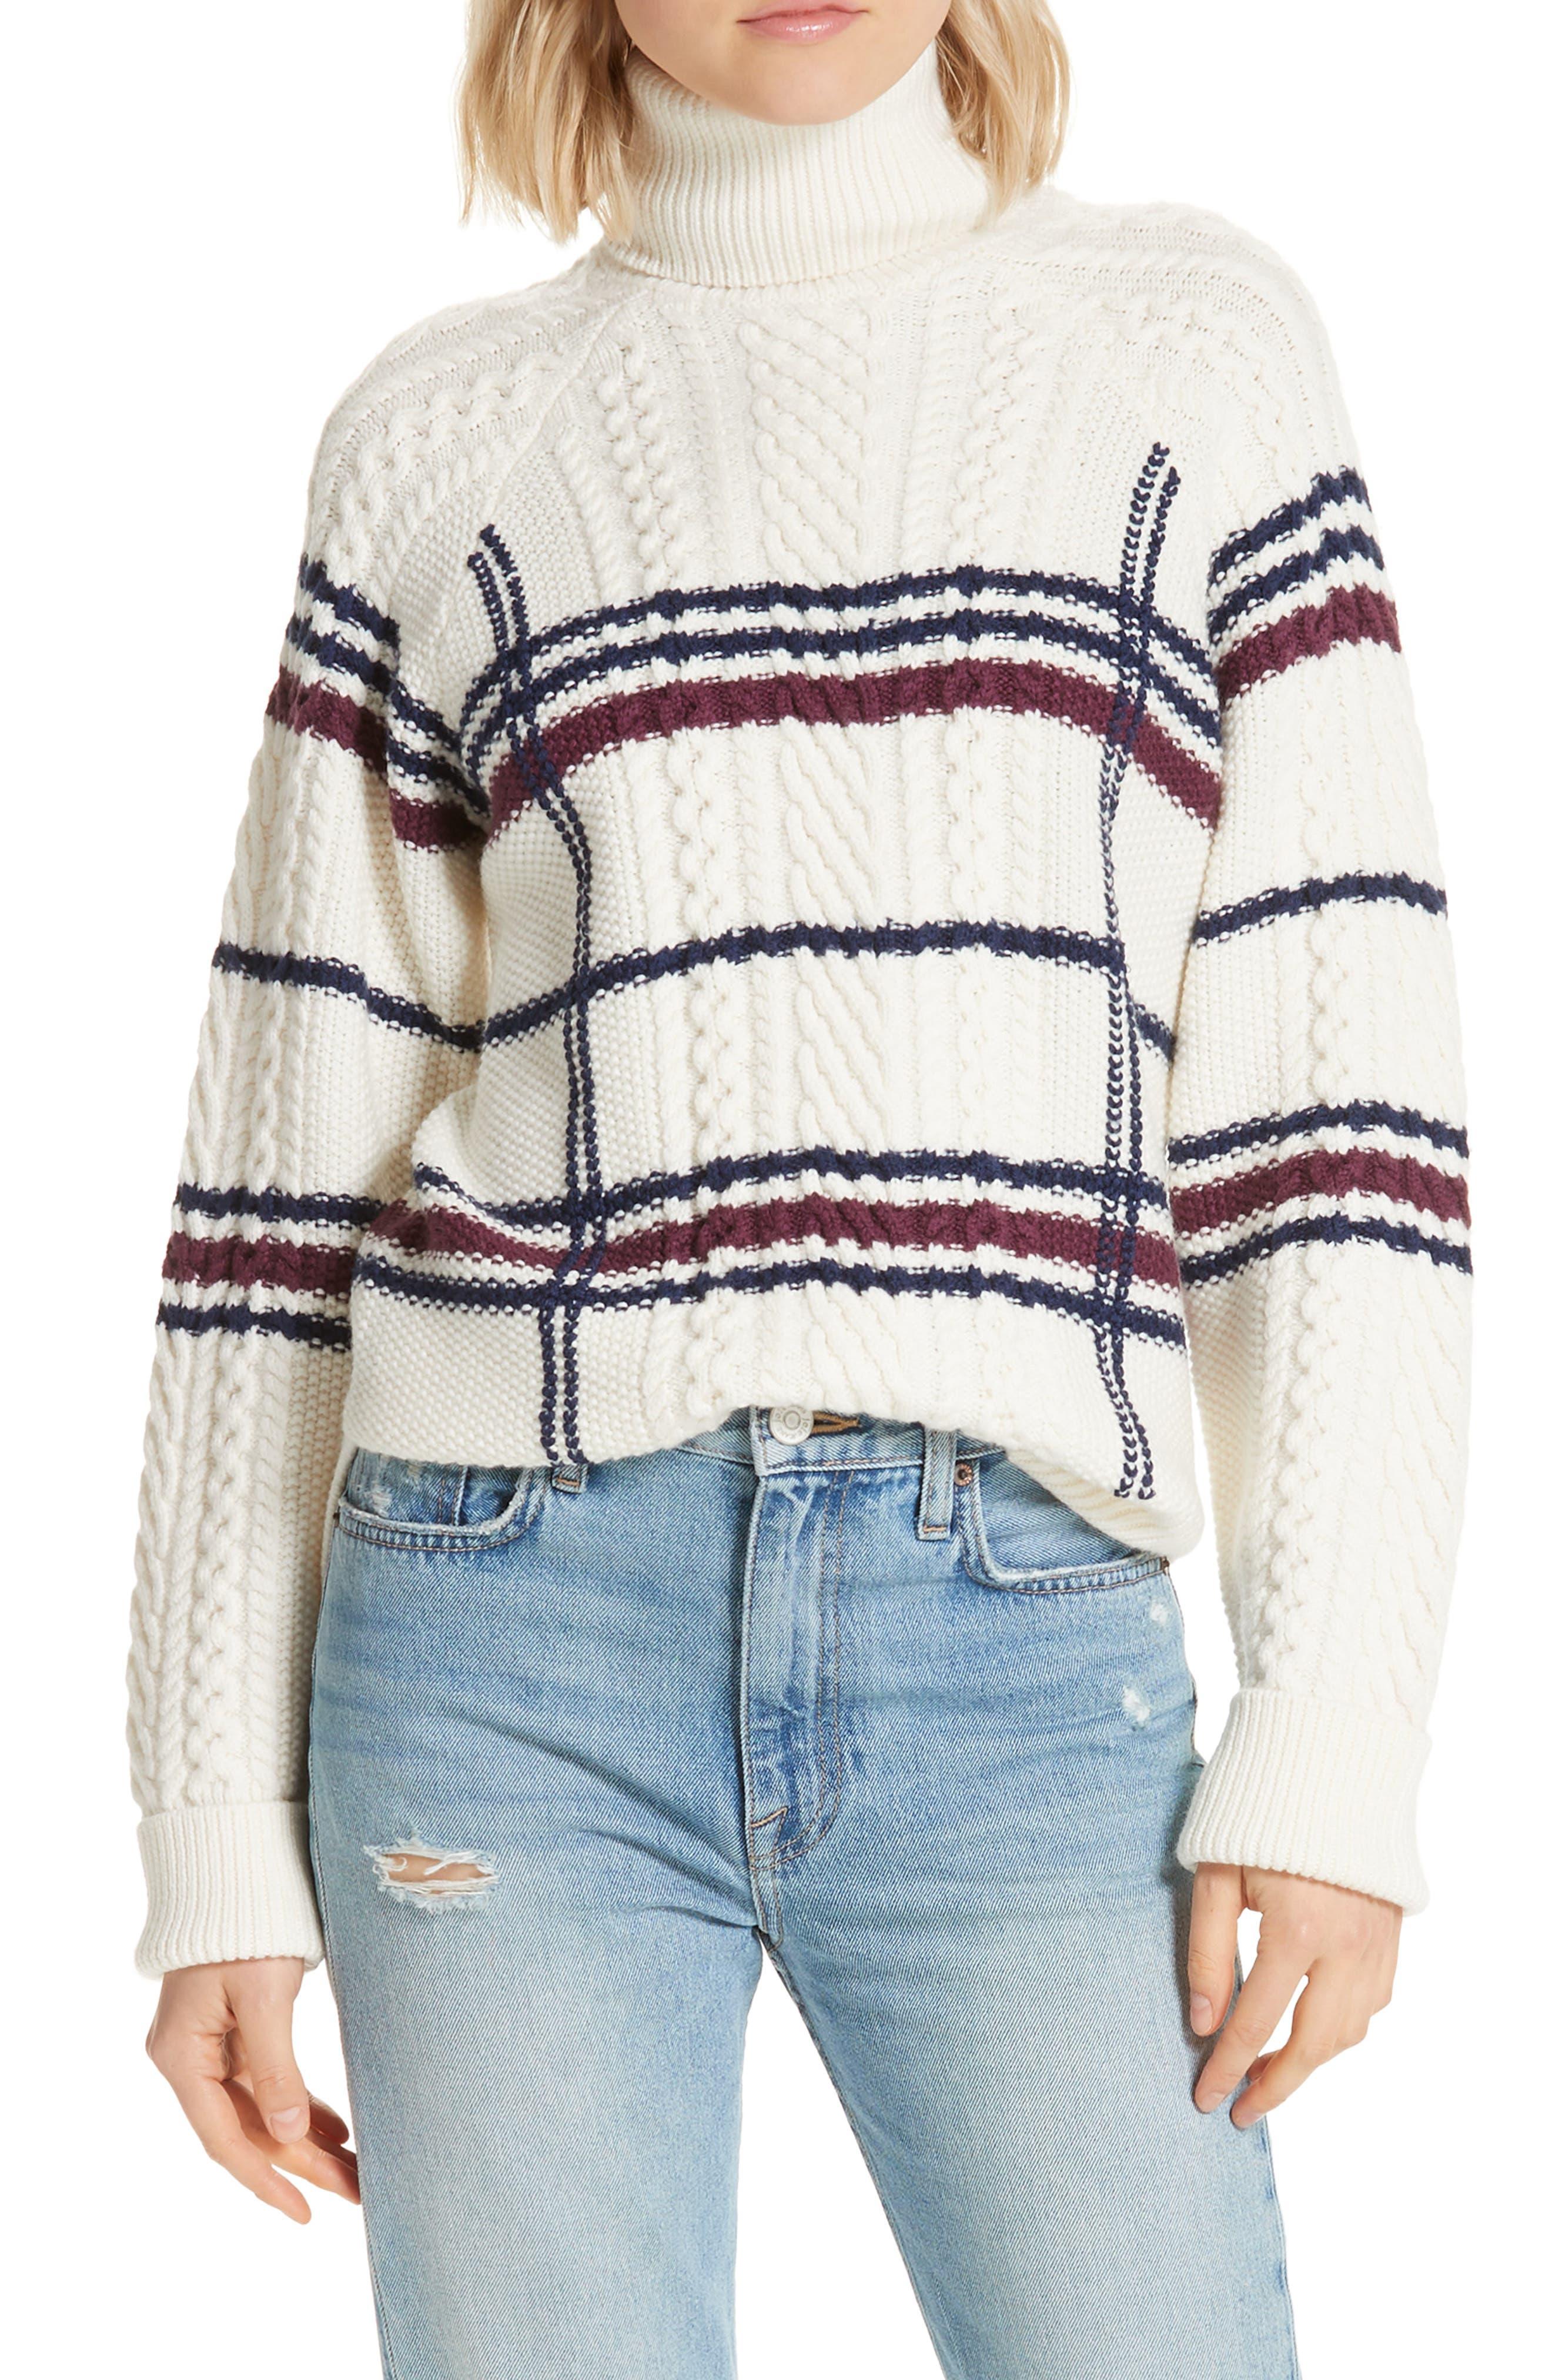 Ashlisa Sweater,                             Main thumbnail 1, color,                             PORCELAIN